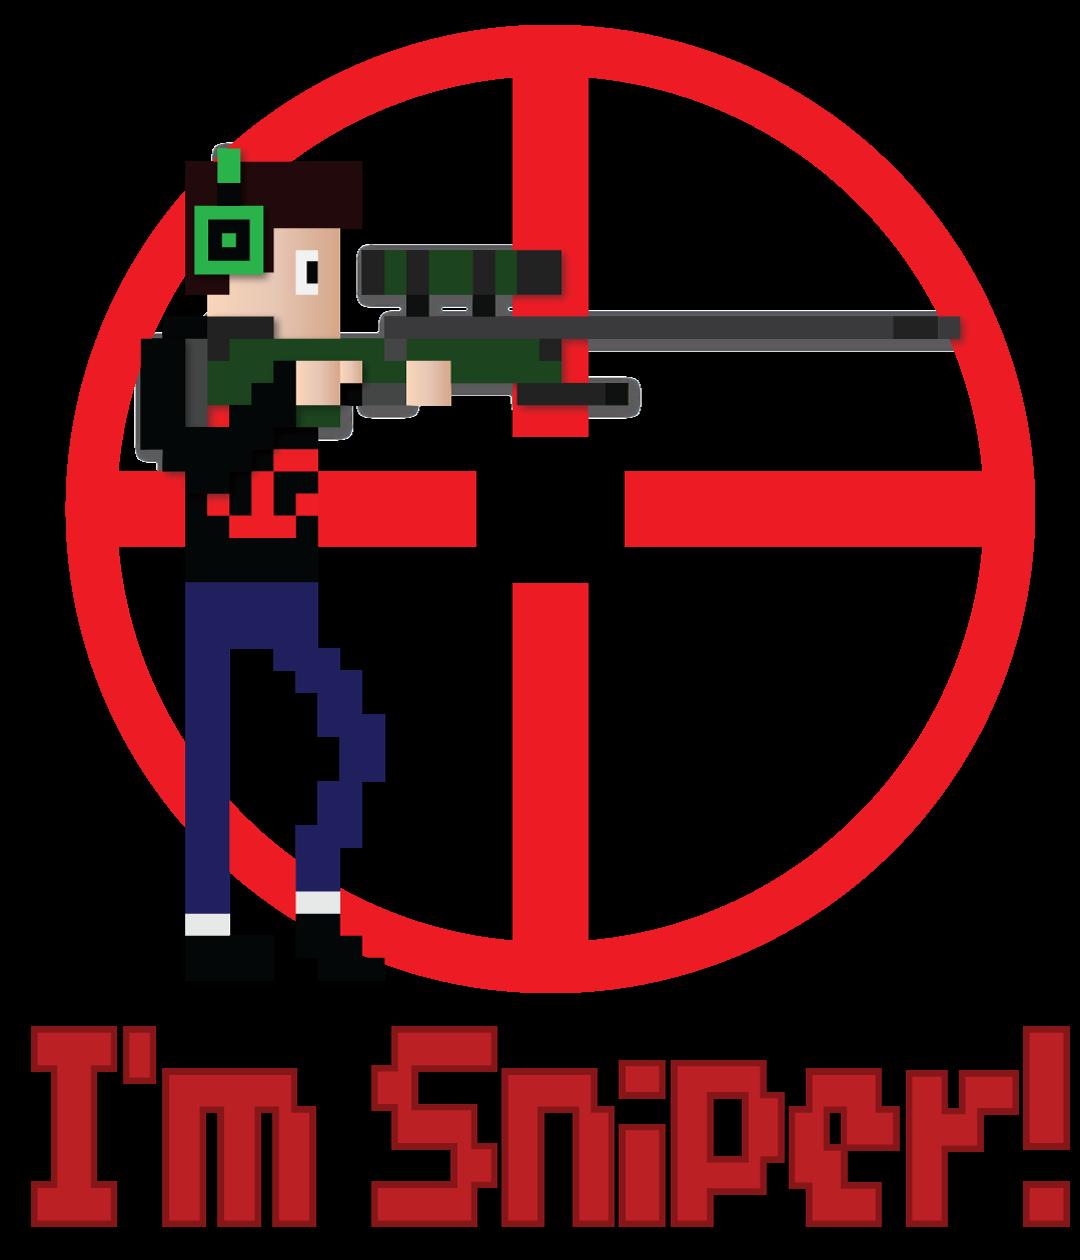 I'm sniper! by Gurock